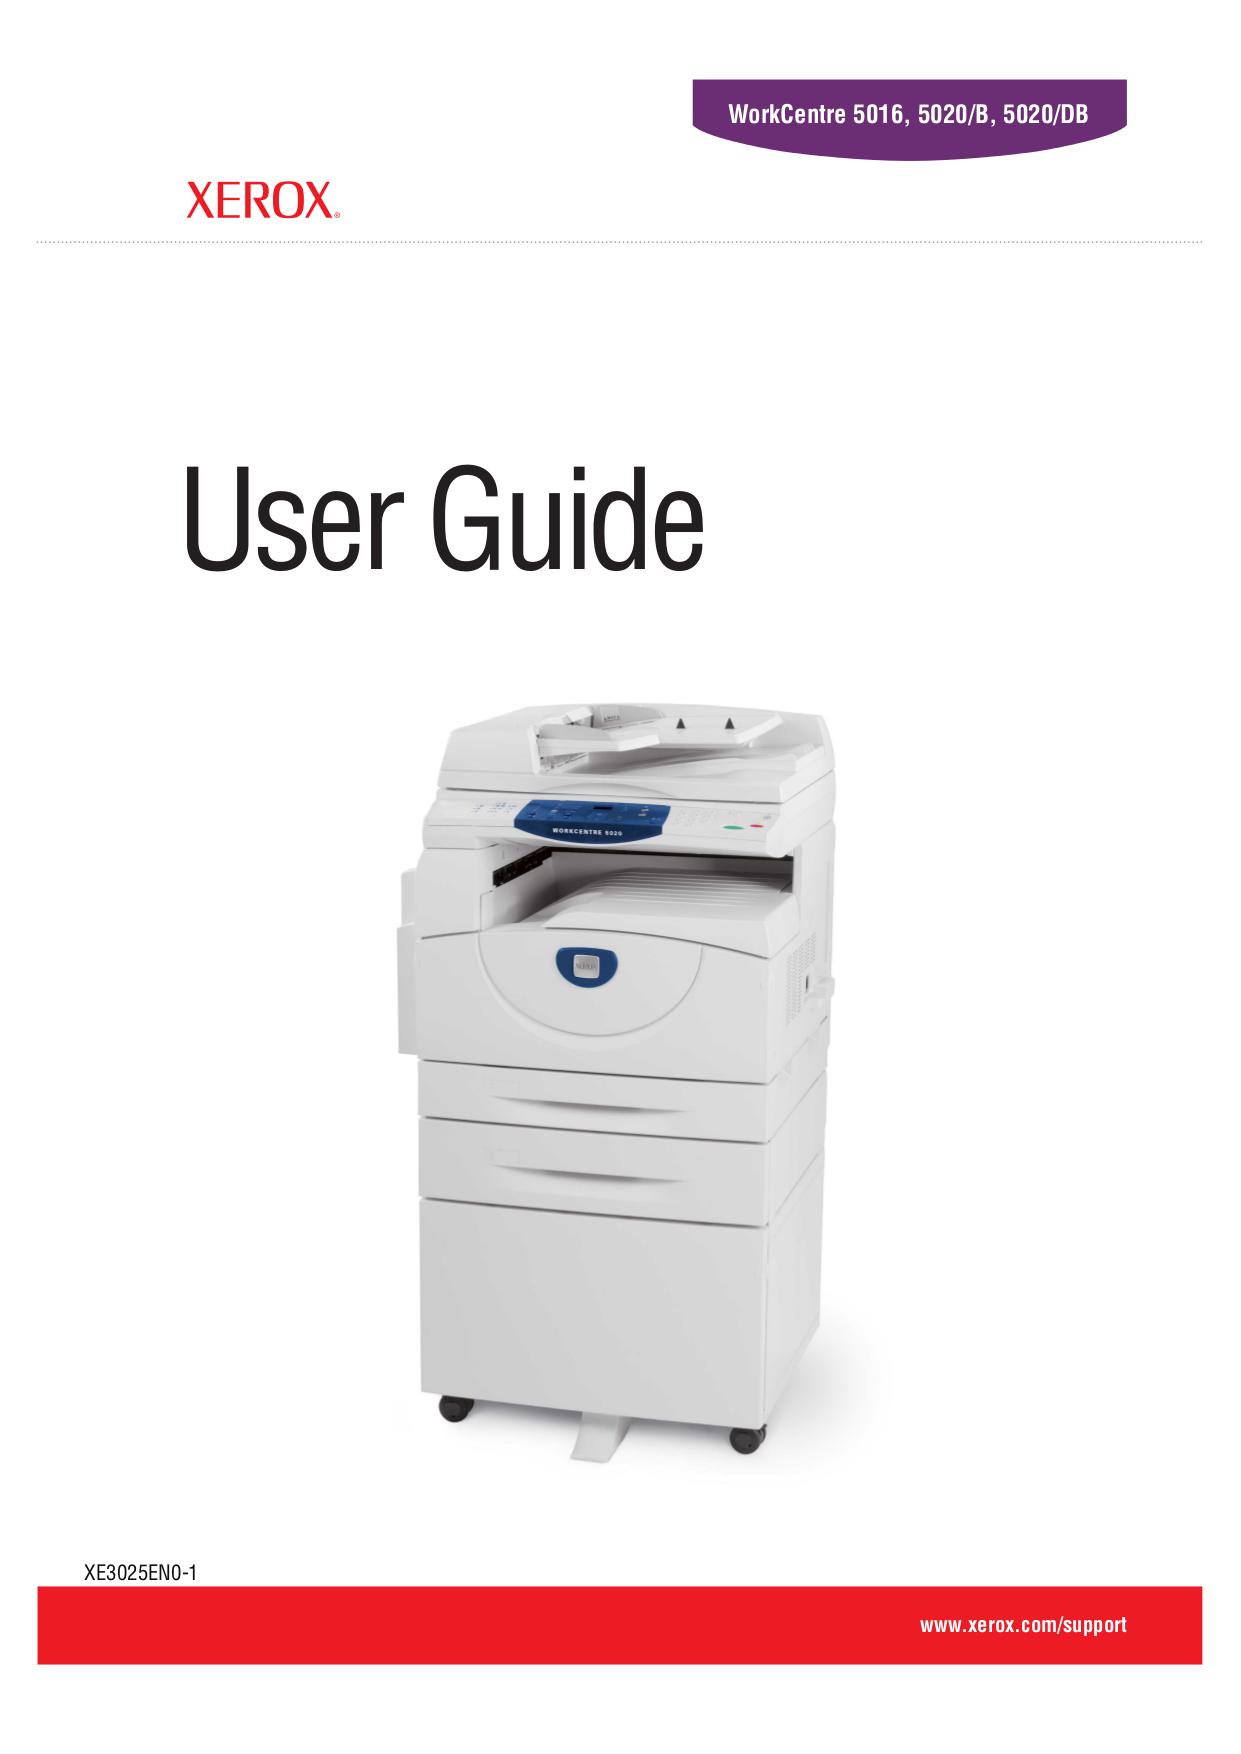 Xerox Workcenter 24 Service Manual